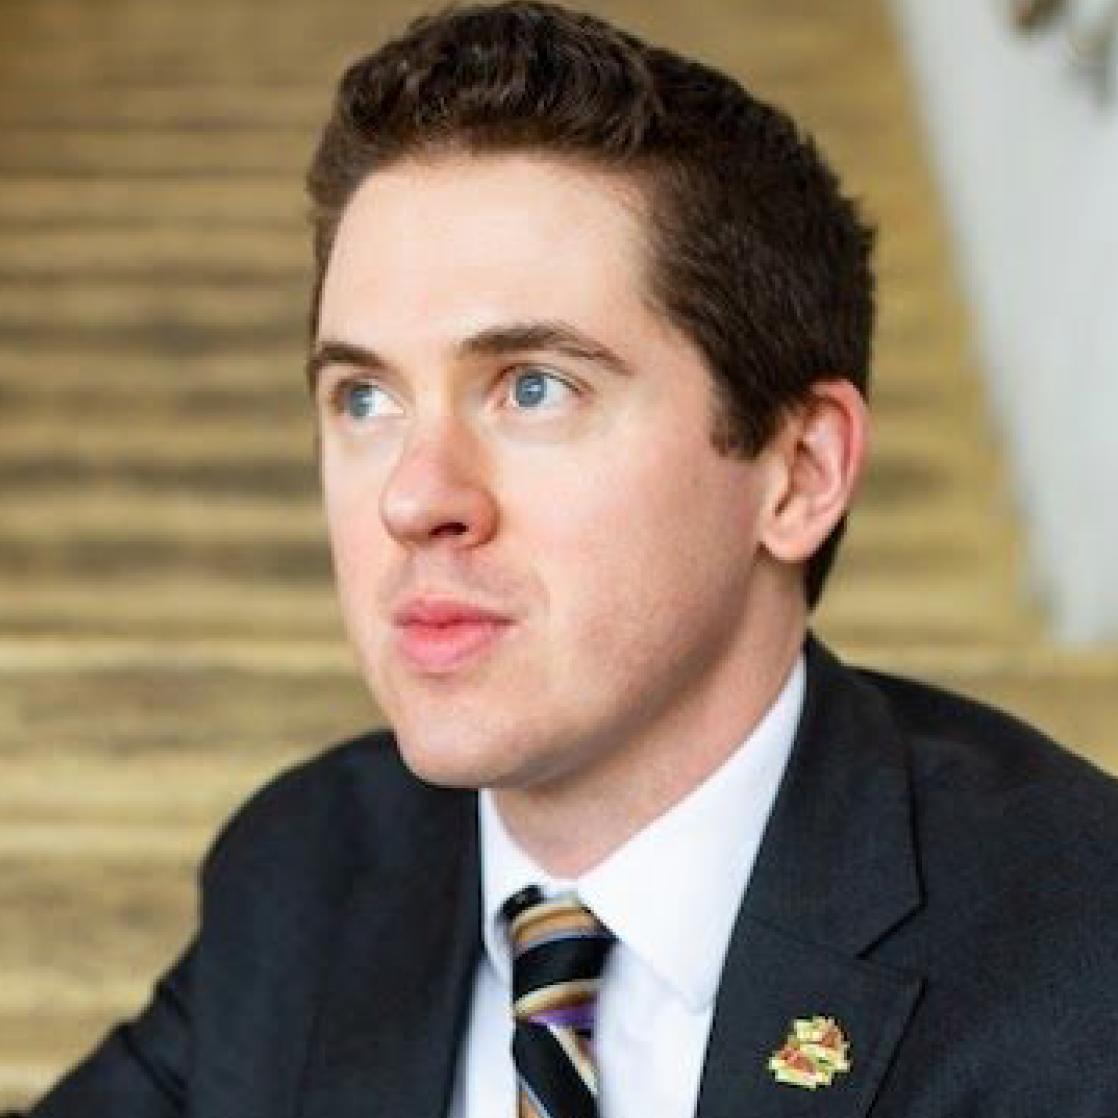 Nate Levin-Aspenson